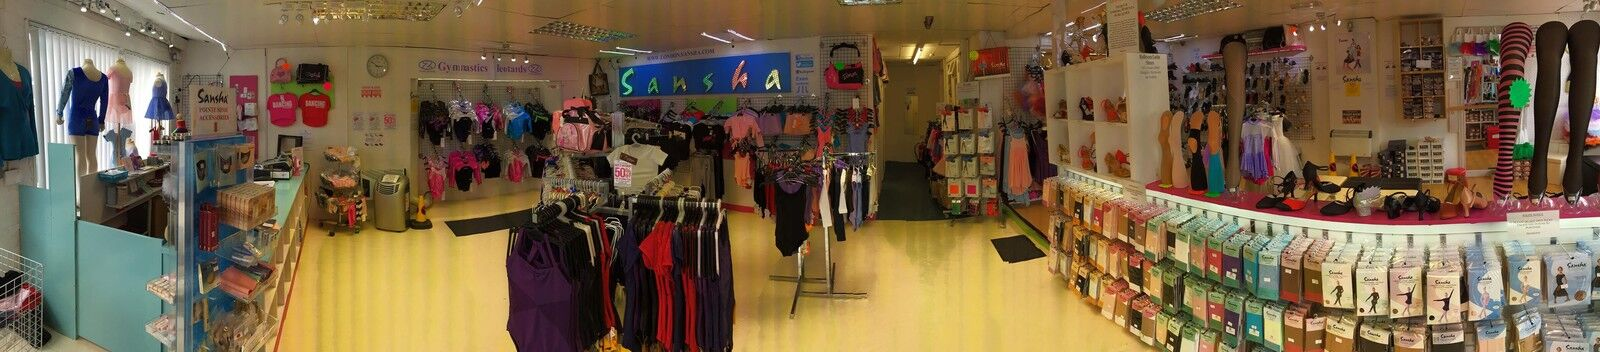 Sansha Dance Shop